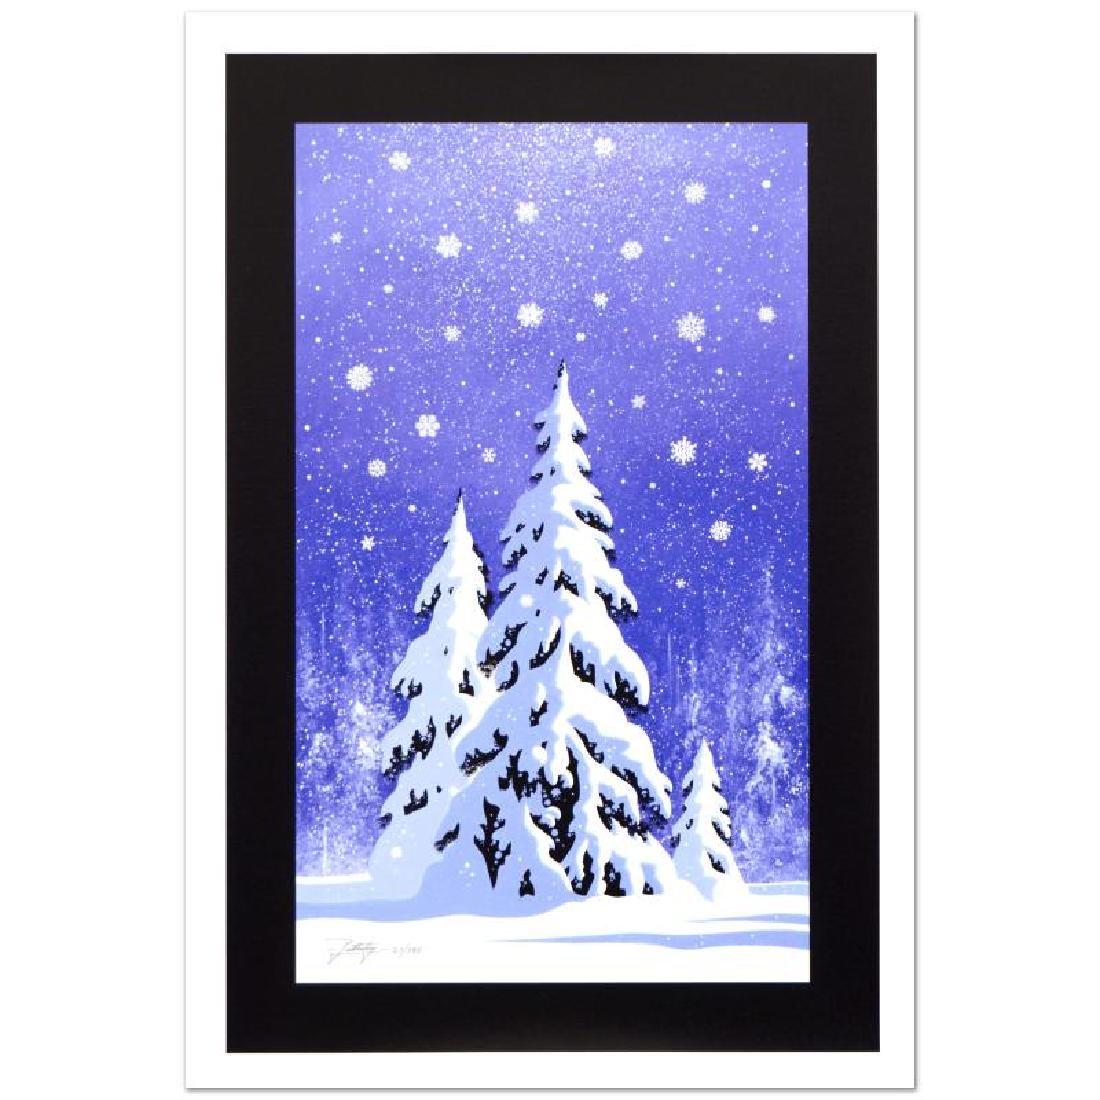 December by Rattenbury, Jon